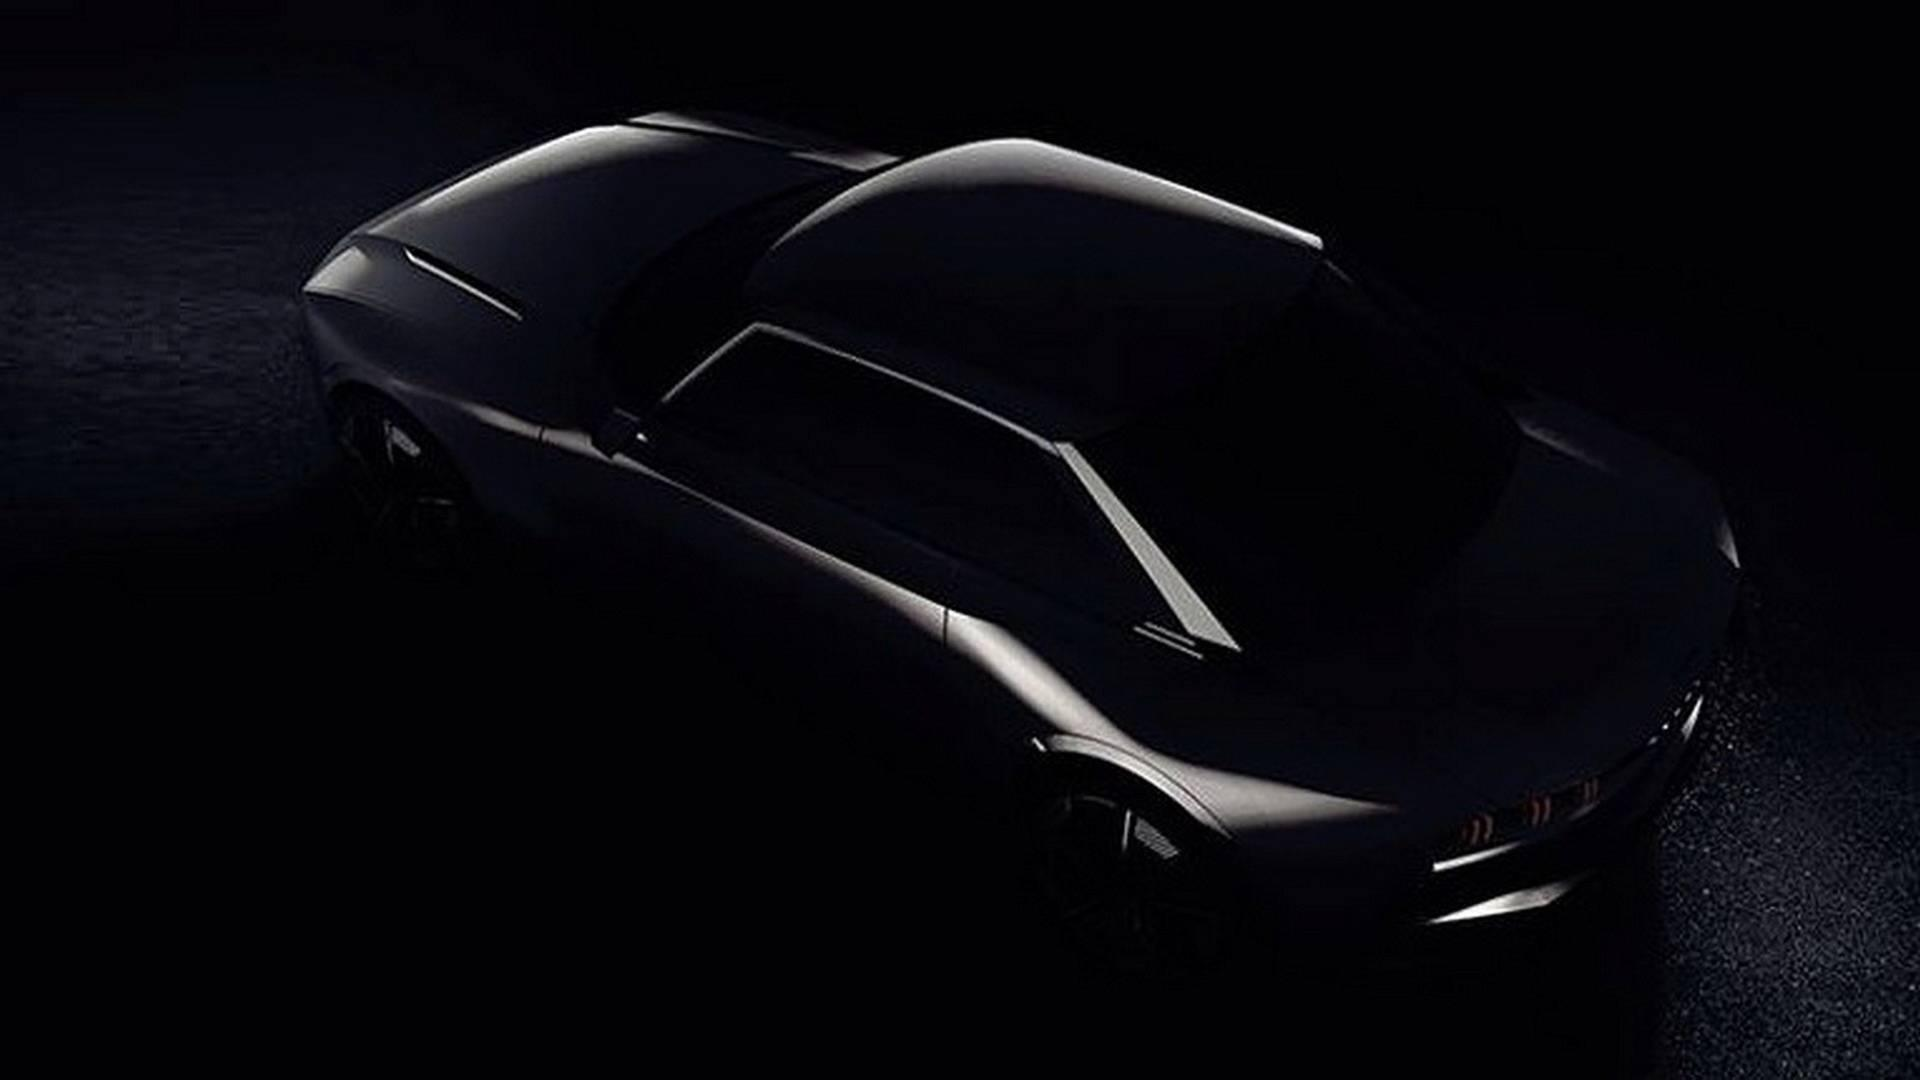 Classic Peugeot 504 Coupe To Be Reborn As Paris Concept